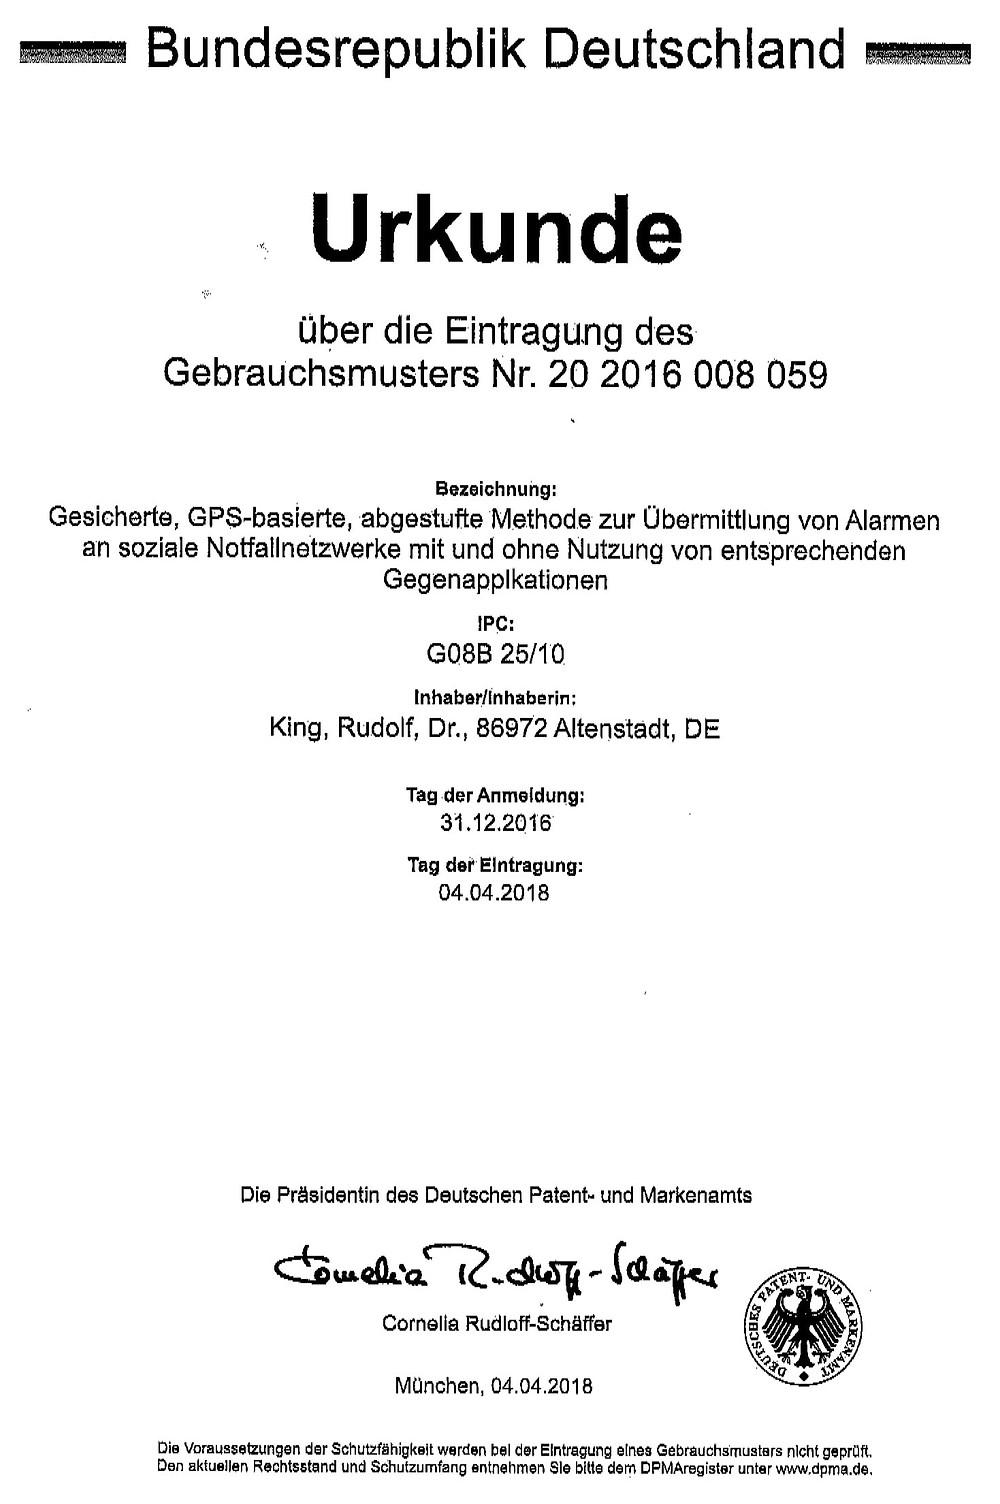 Gebrauchsmuster Dr Rudolf King SwiftAlarm!